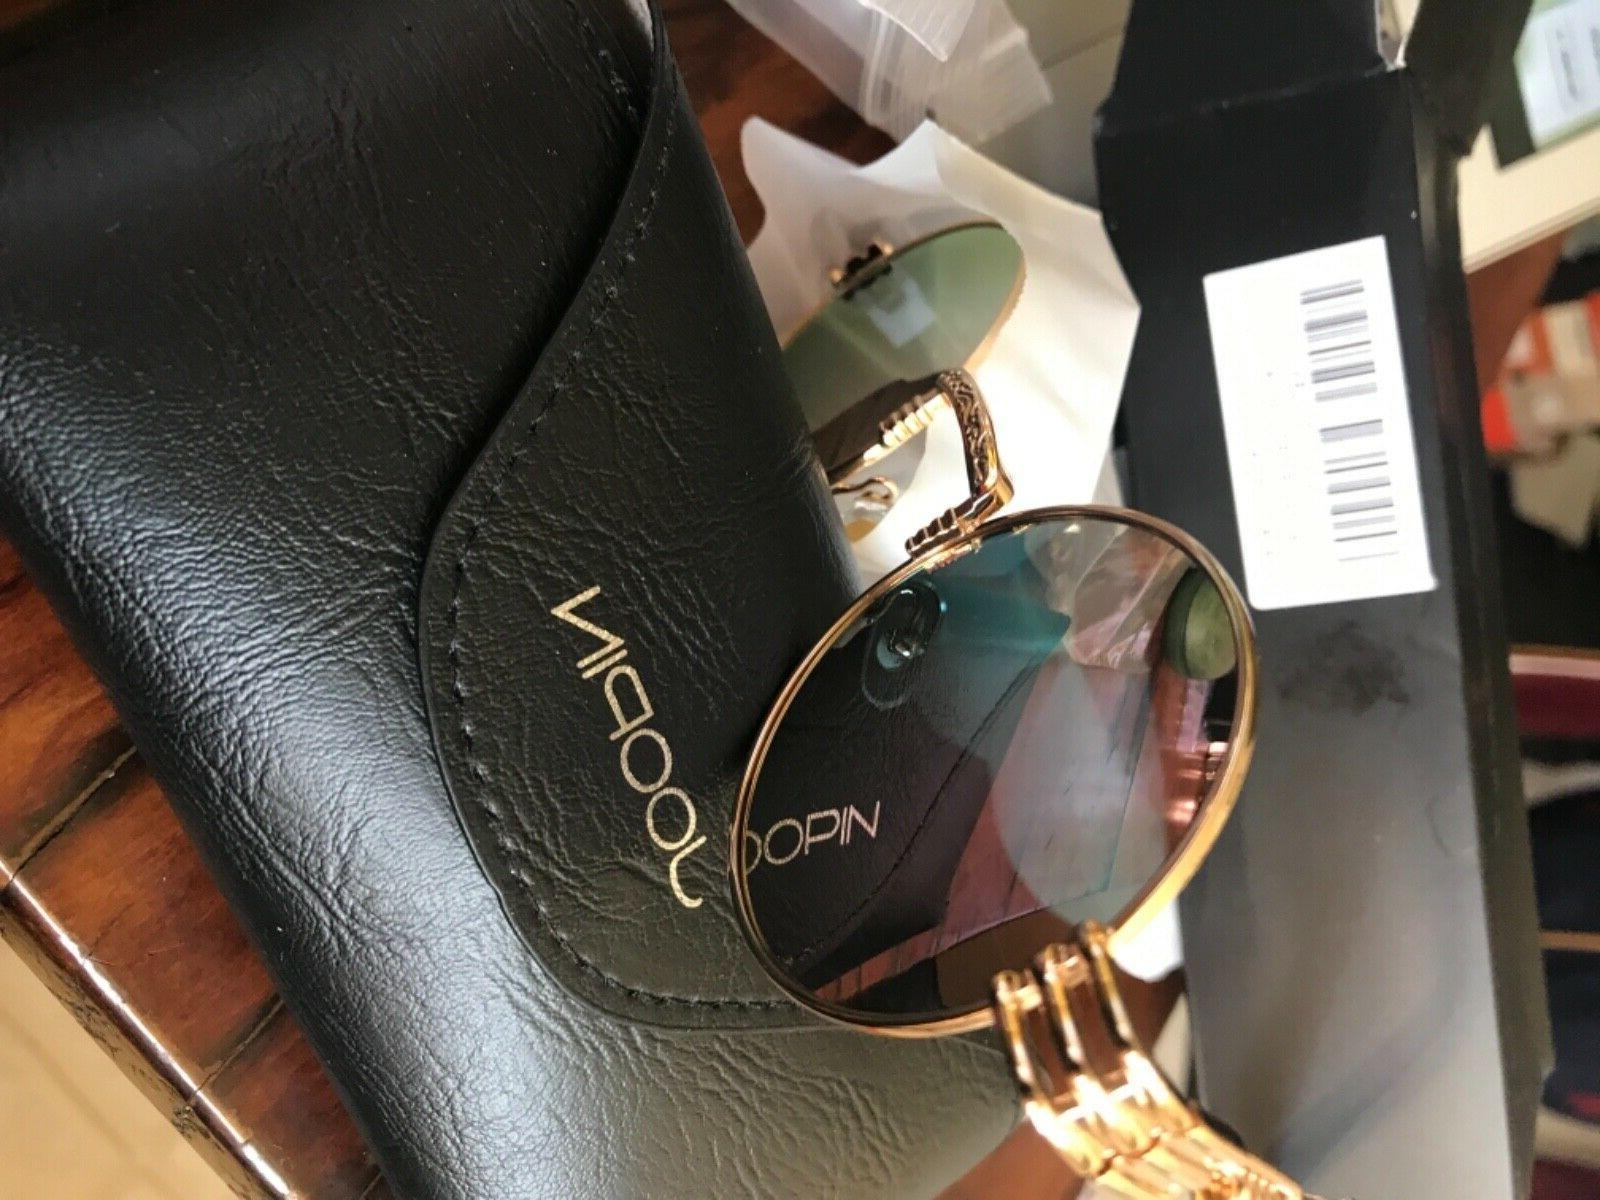 brand new sunglasses jin fen